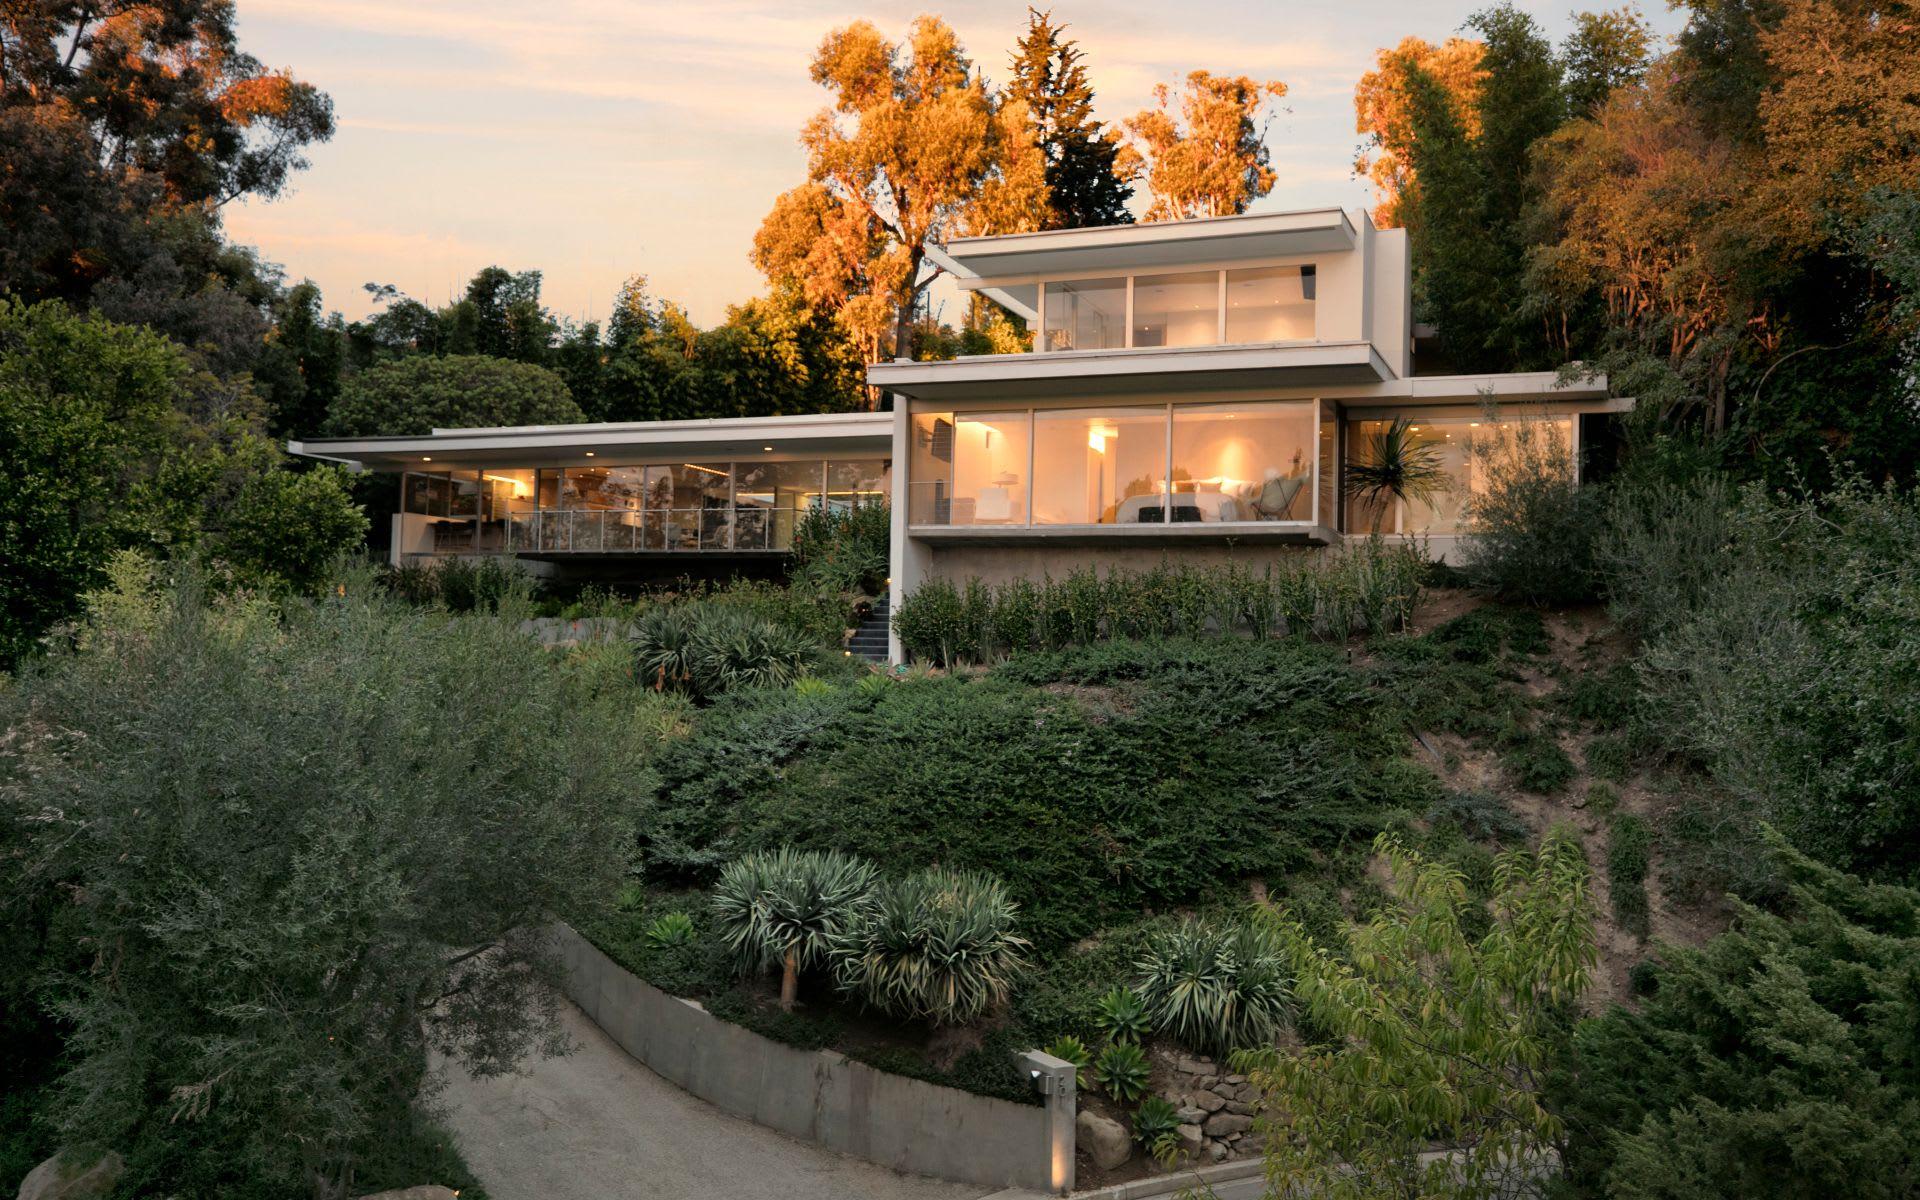 Casa para uma família para Venda às 201 Bentley Cir 201 Bentley Cir Los Angeles, Califórnia,90049 Estados Unidos